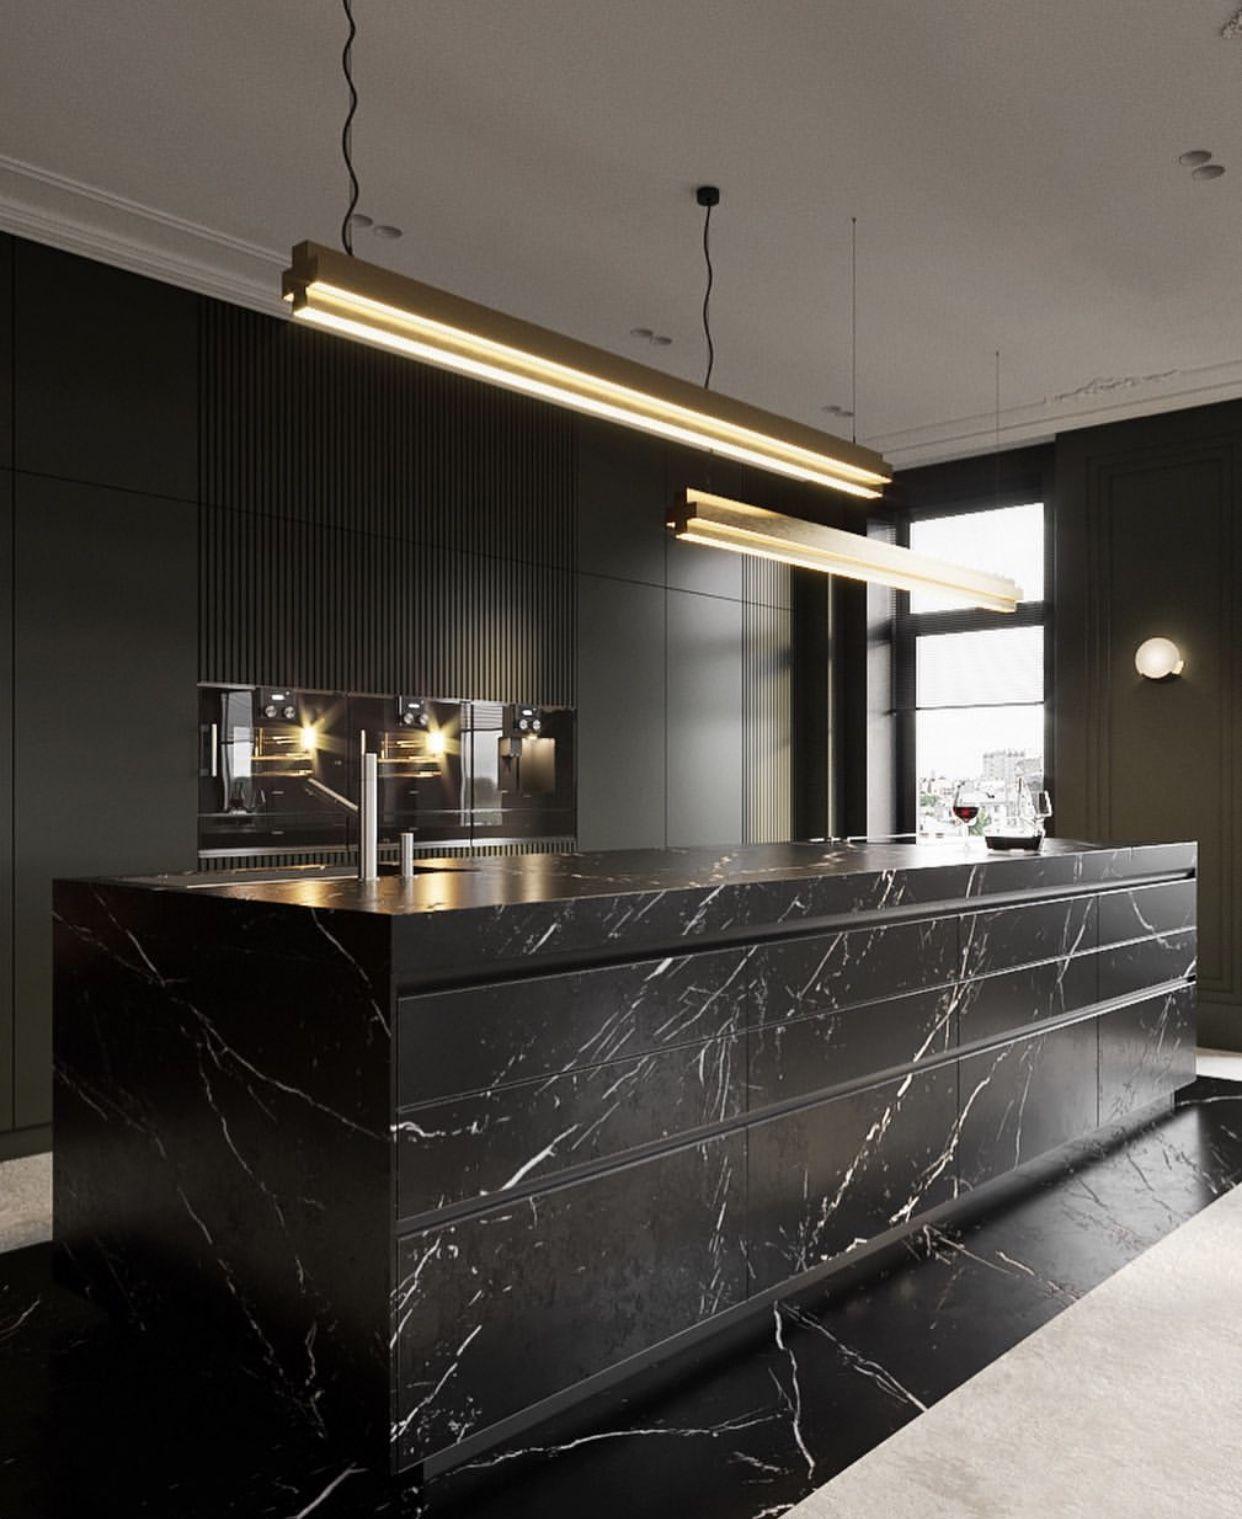 Black Marble Design Cucine Arredo Interni Cucina Arredamento Isola Cucina